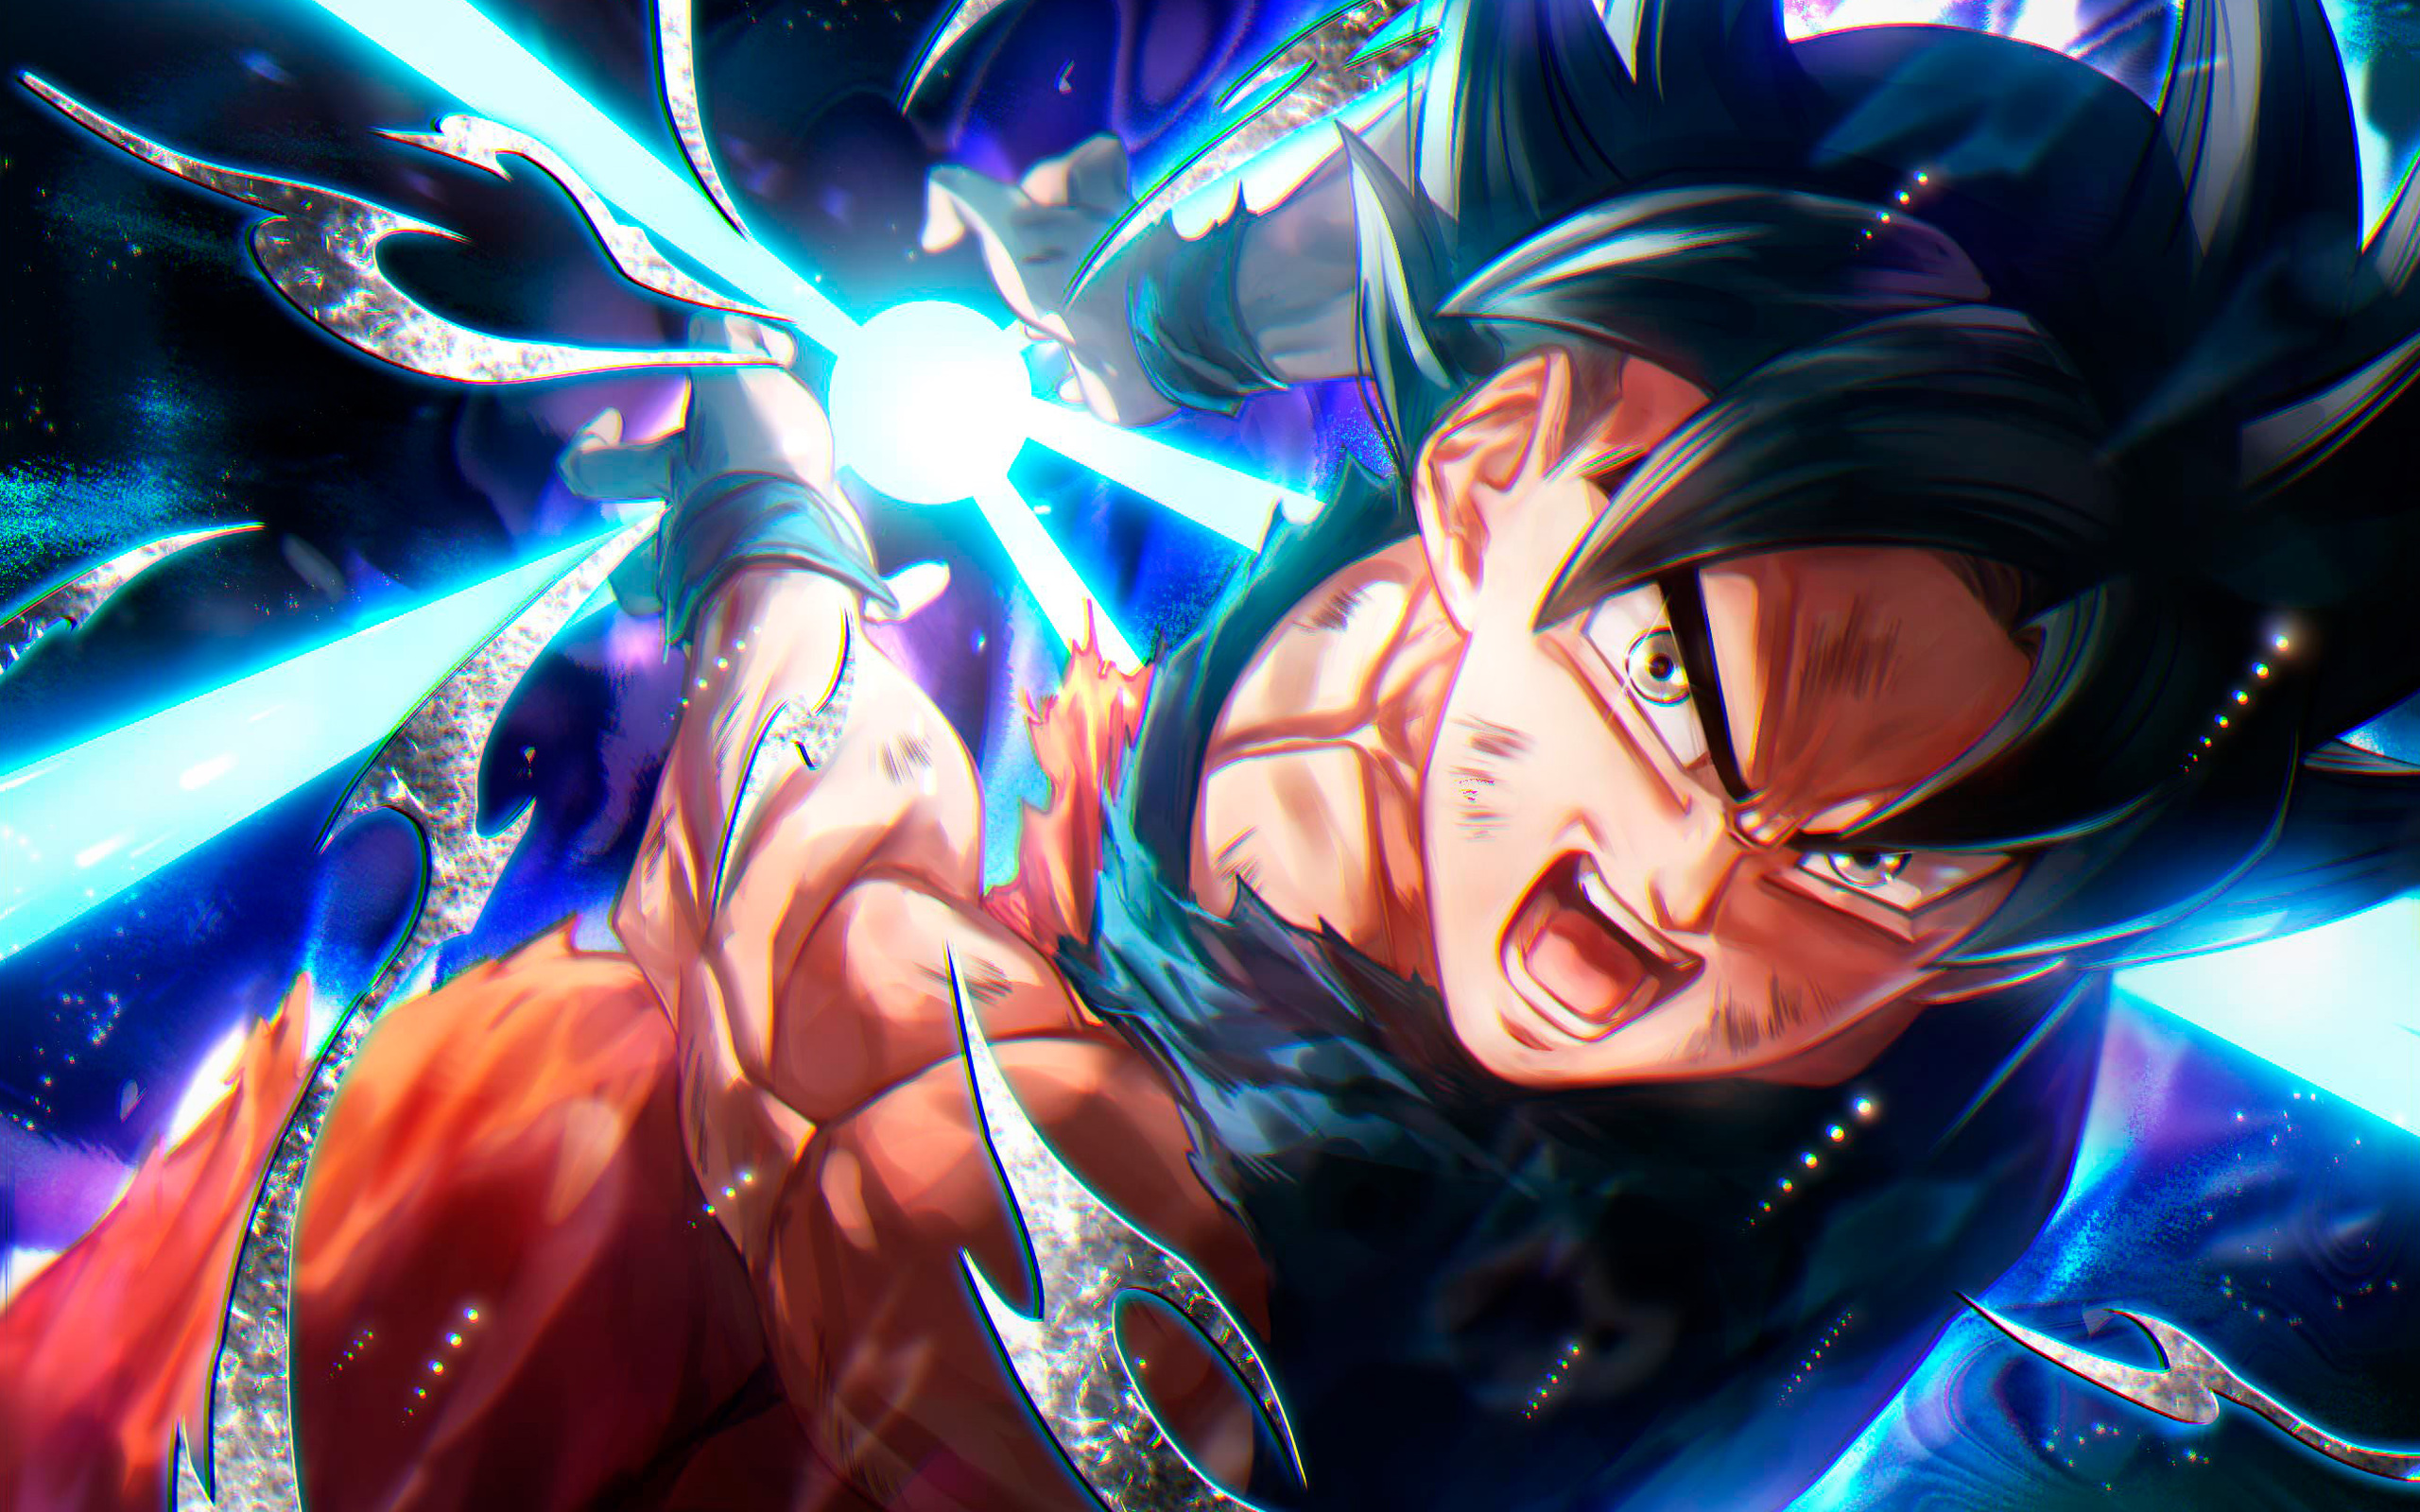 goku-in-dragon-ball-super-anime-4k-rnc.jpg